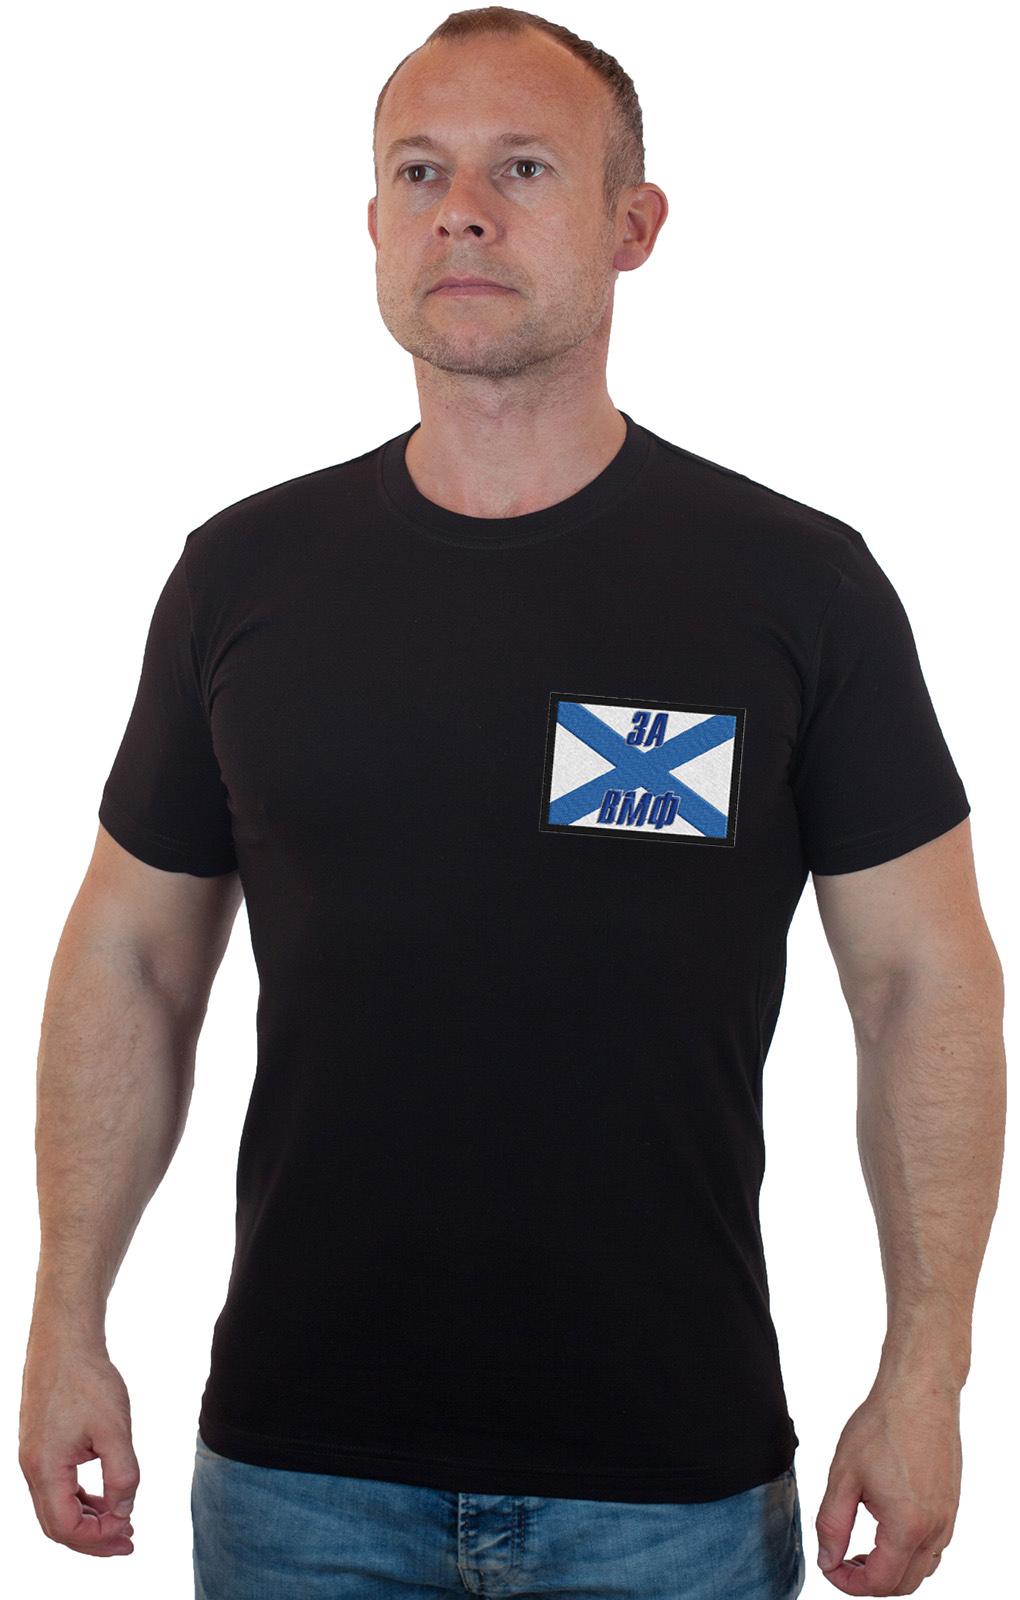 Мужская хлопковая футболка с вышивкой За ВМФ